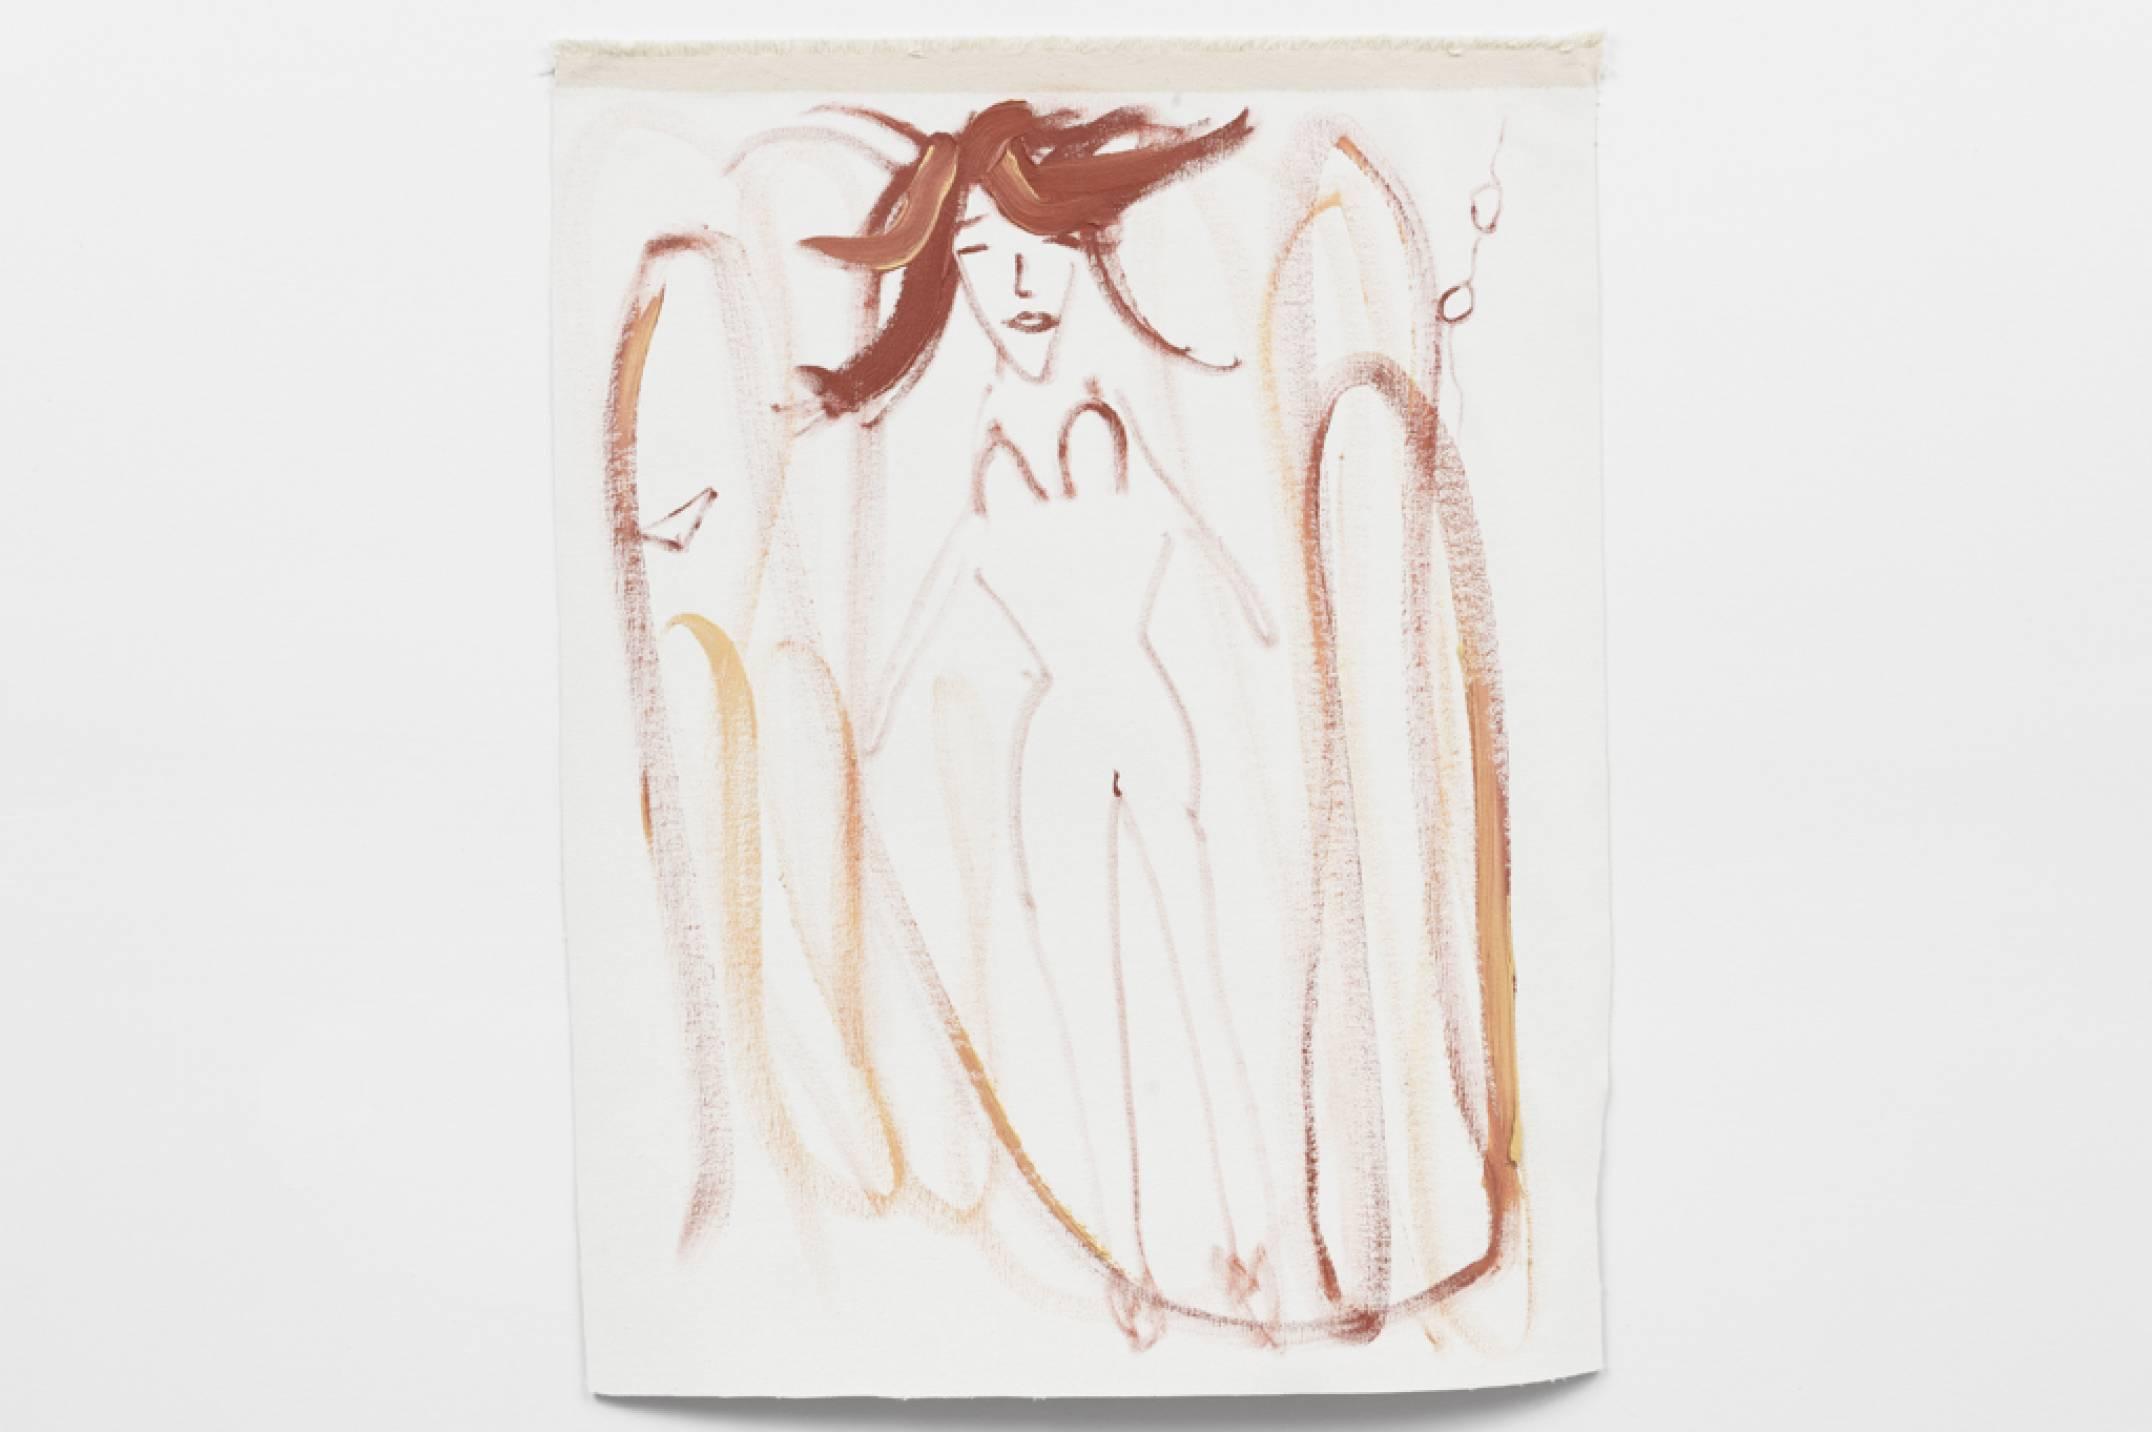 Trevor Shimizu,&nbsp;<em>untitled (zero gravity 4), not aged</em>,&nbsp;2017,&nbsp;oil on canvas, 91 × 81 cm - Mendes Wood DM